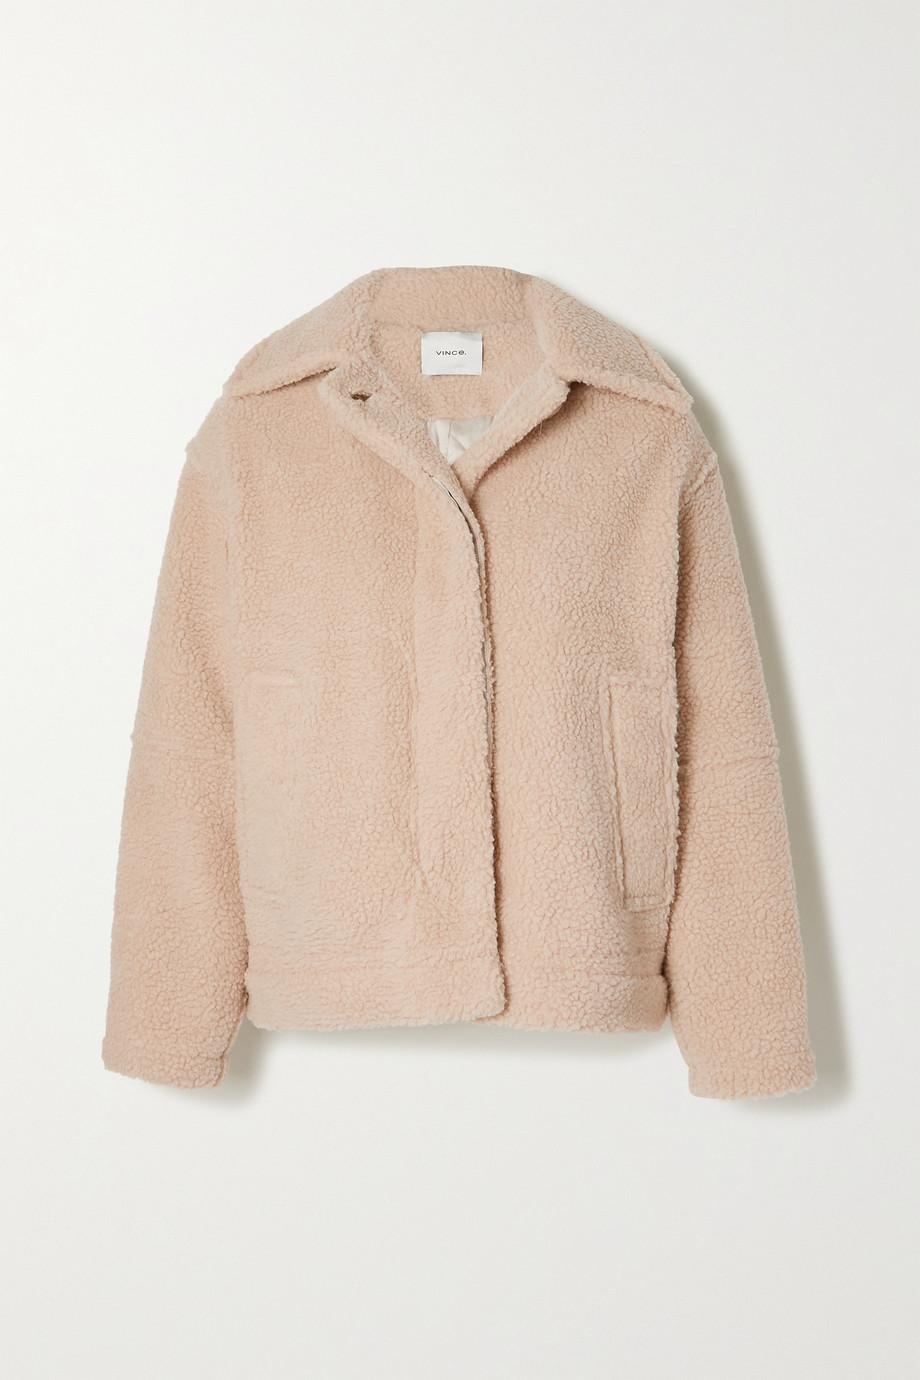 Vince Paneled faux shearling jacket